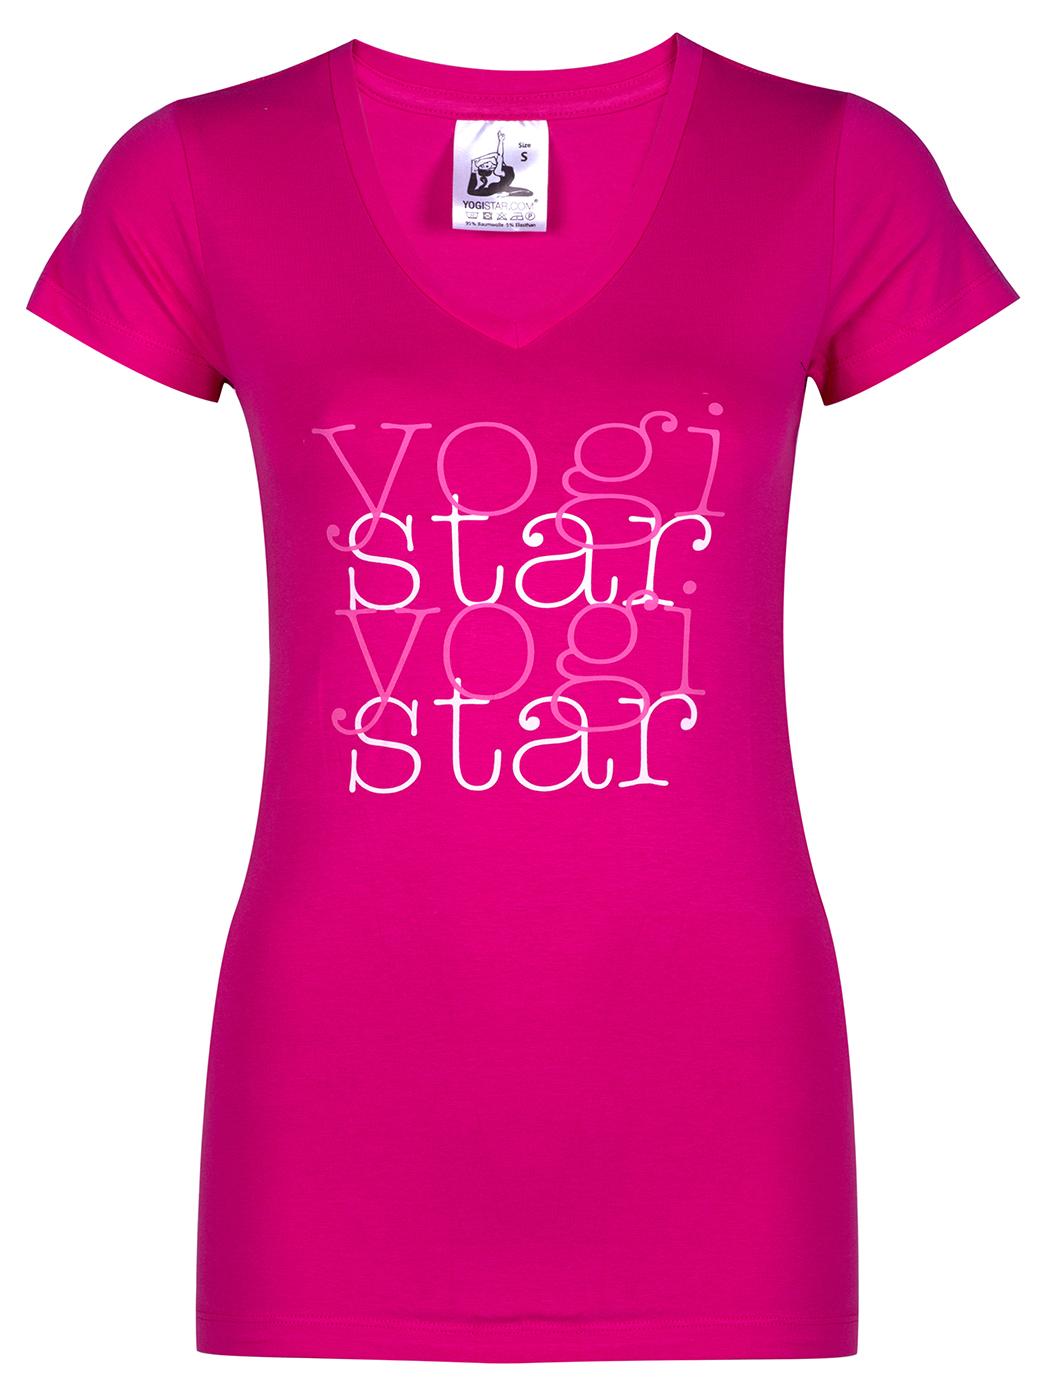 "Yoga-T-Shirt ""yogistar"" - pink"